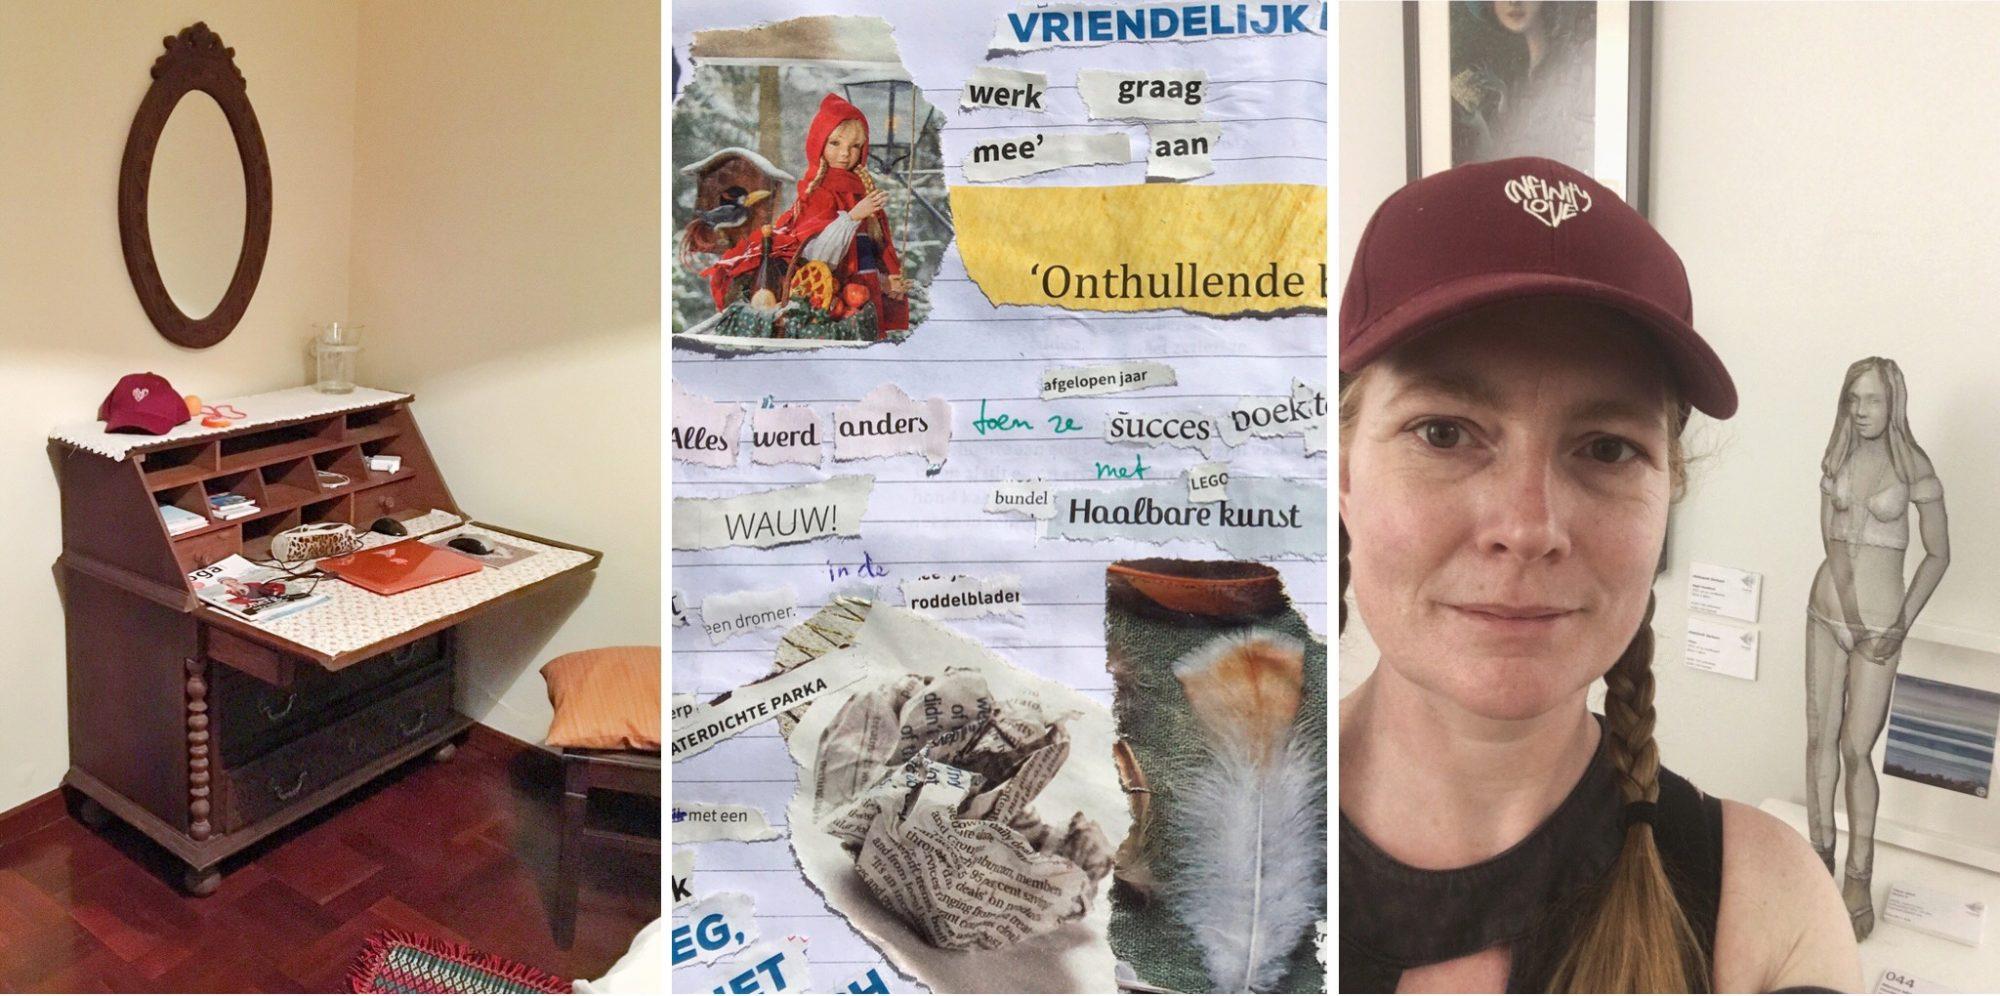 Tineke's blog